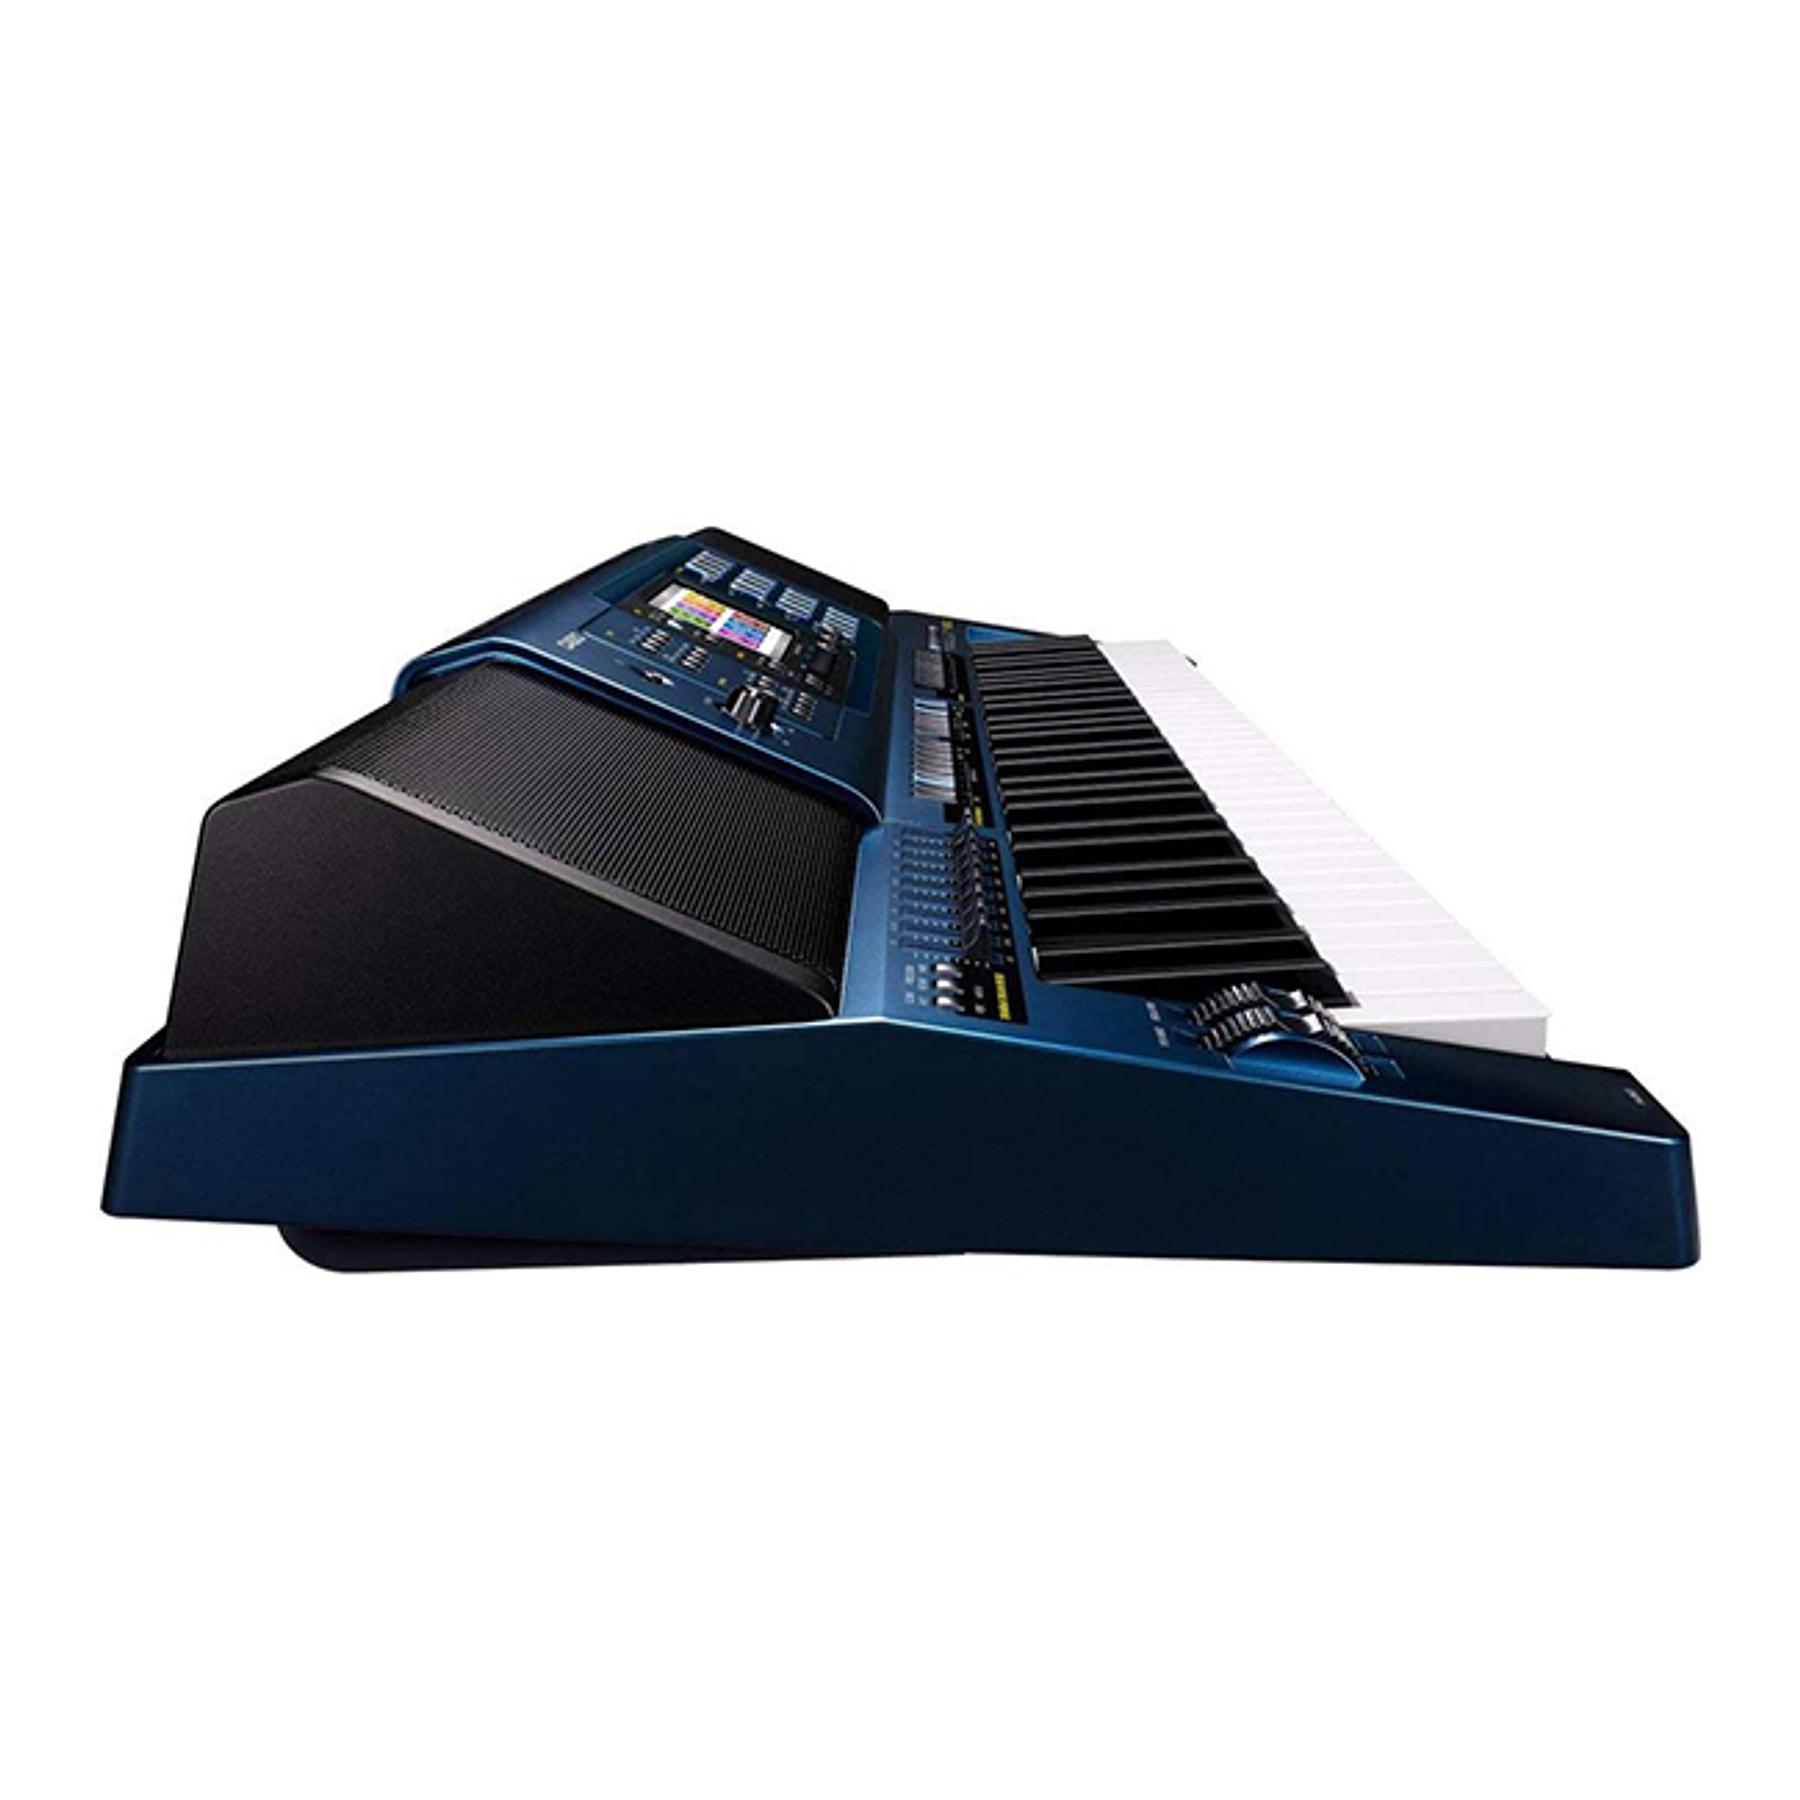 Teclado Casio MZ-X500